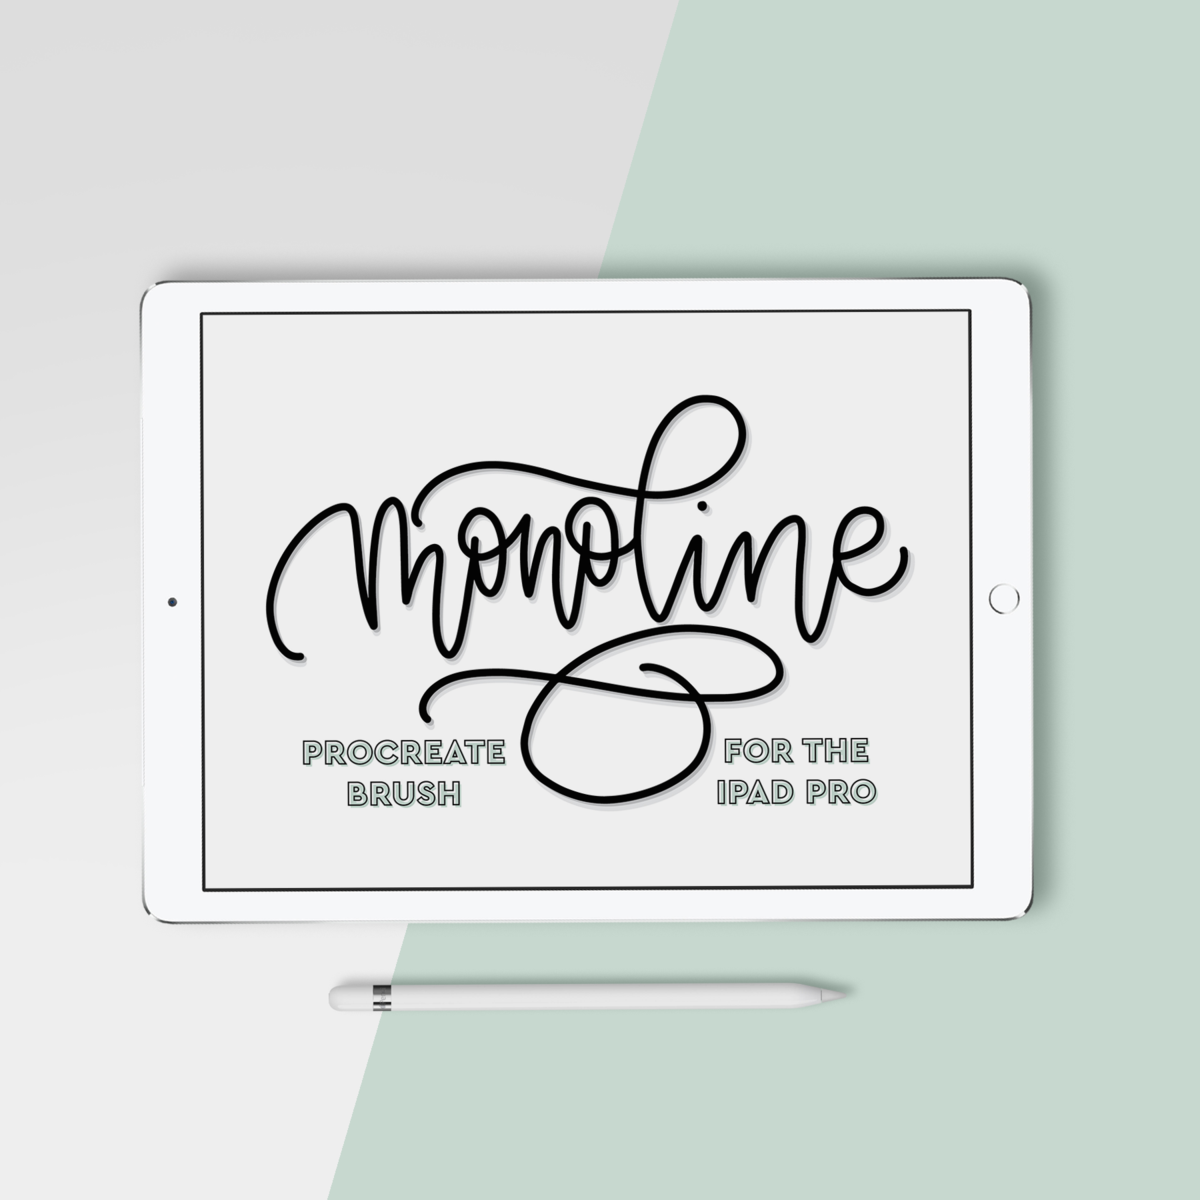 Procreate Brush Ipad Lettering Monoline Brush